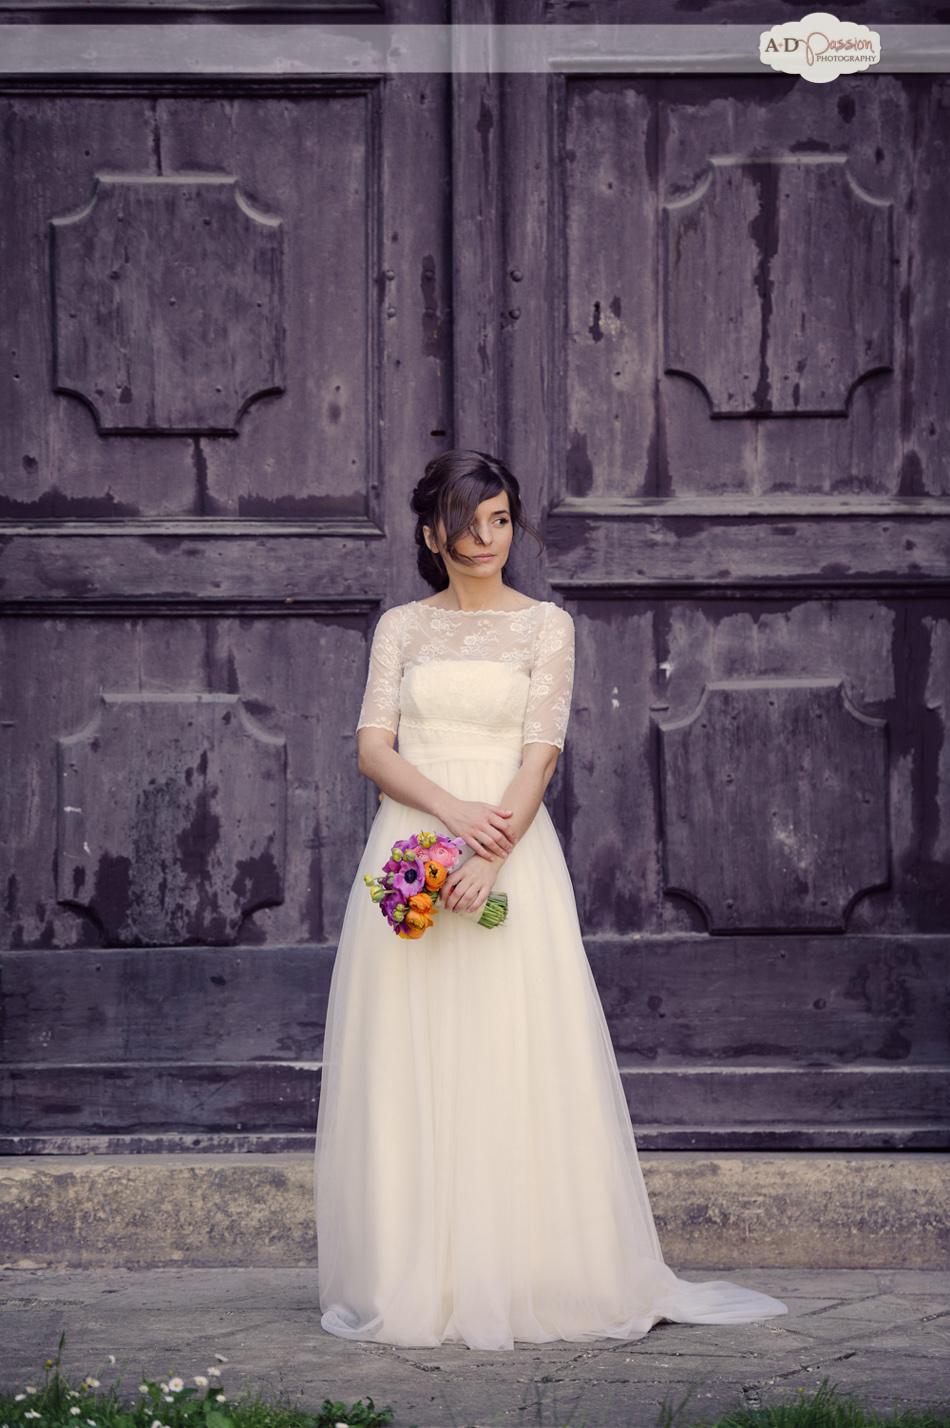 AD Passion Photography | 20130529_fotograf-nunta_elisa_si_marius_0076 | Adelin, Dida, fotograf profesionist, fotograf de nunta, fotografie de nunta, fotograf Timisoara, fotograf Craiova, fotograf Bucuresti, fotograf Arad, nunta Timisoara, nunta Arad, nunta Bucuresti, nunta Craiova